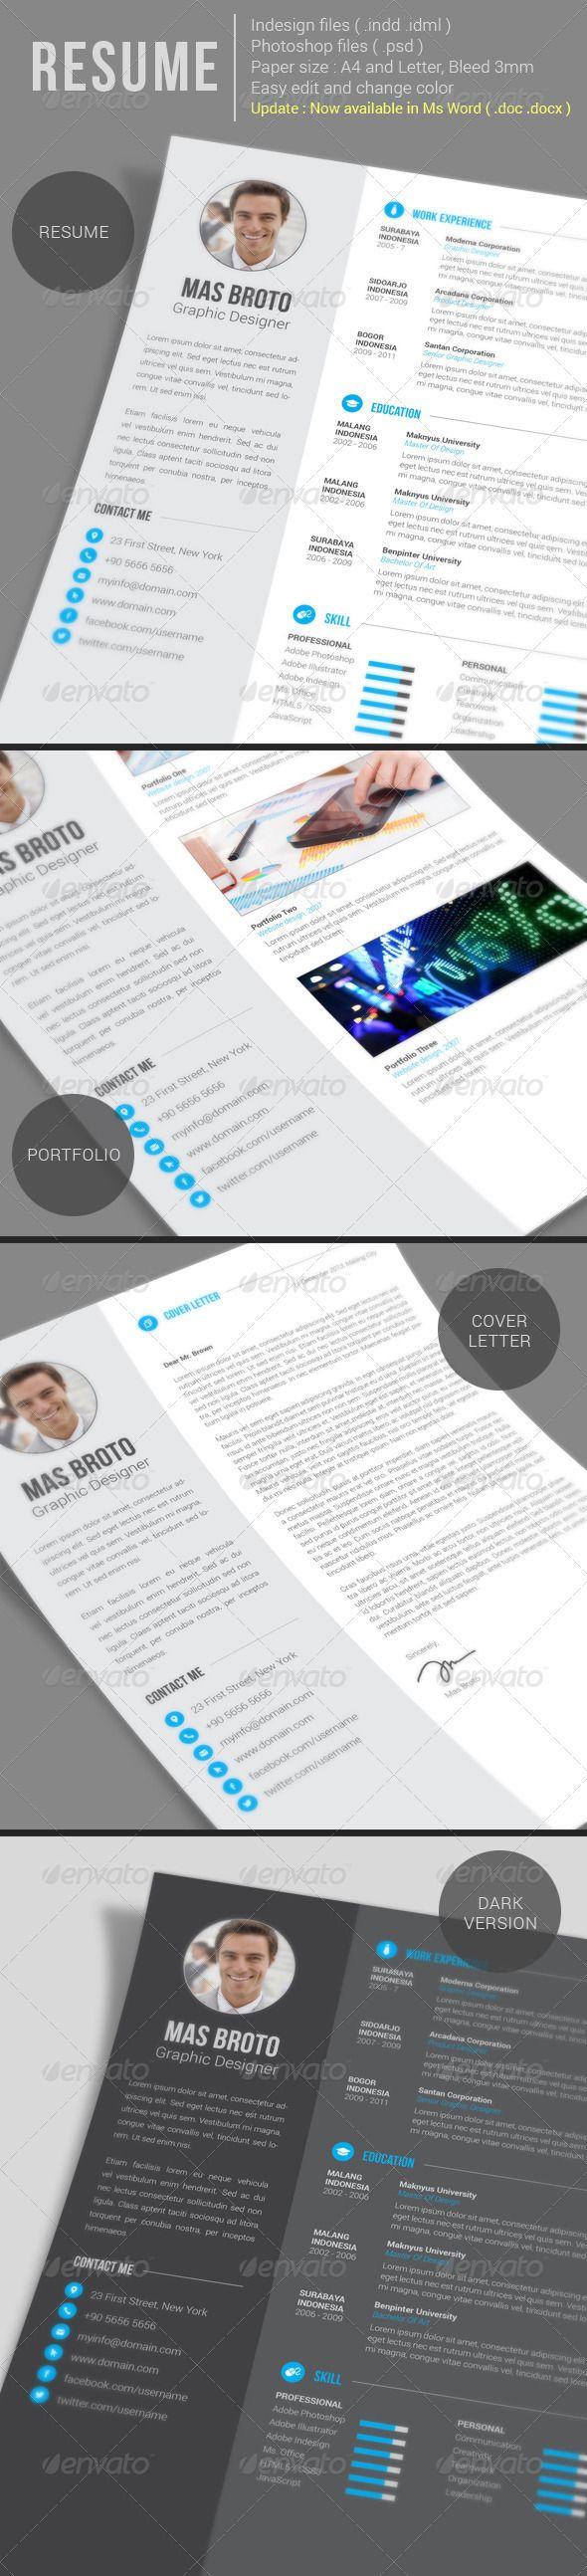 Resume (update) Resumes Stationery Resume design